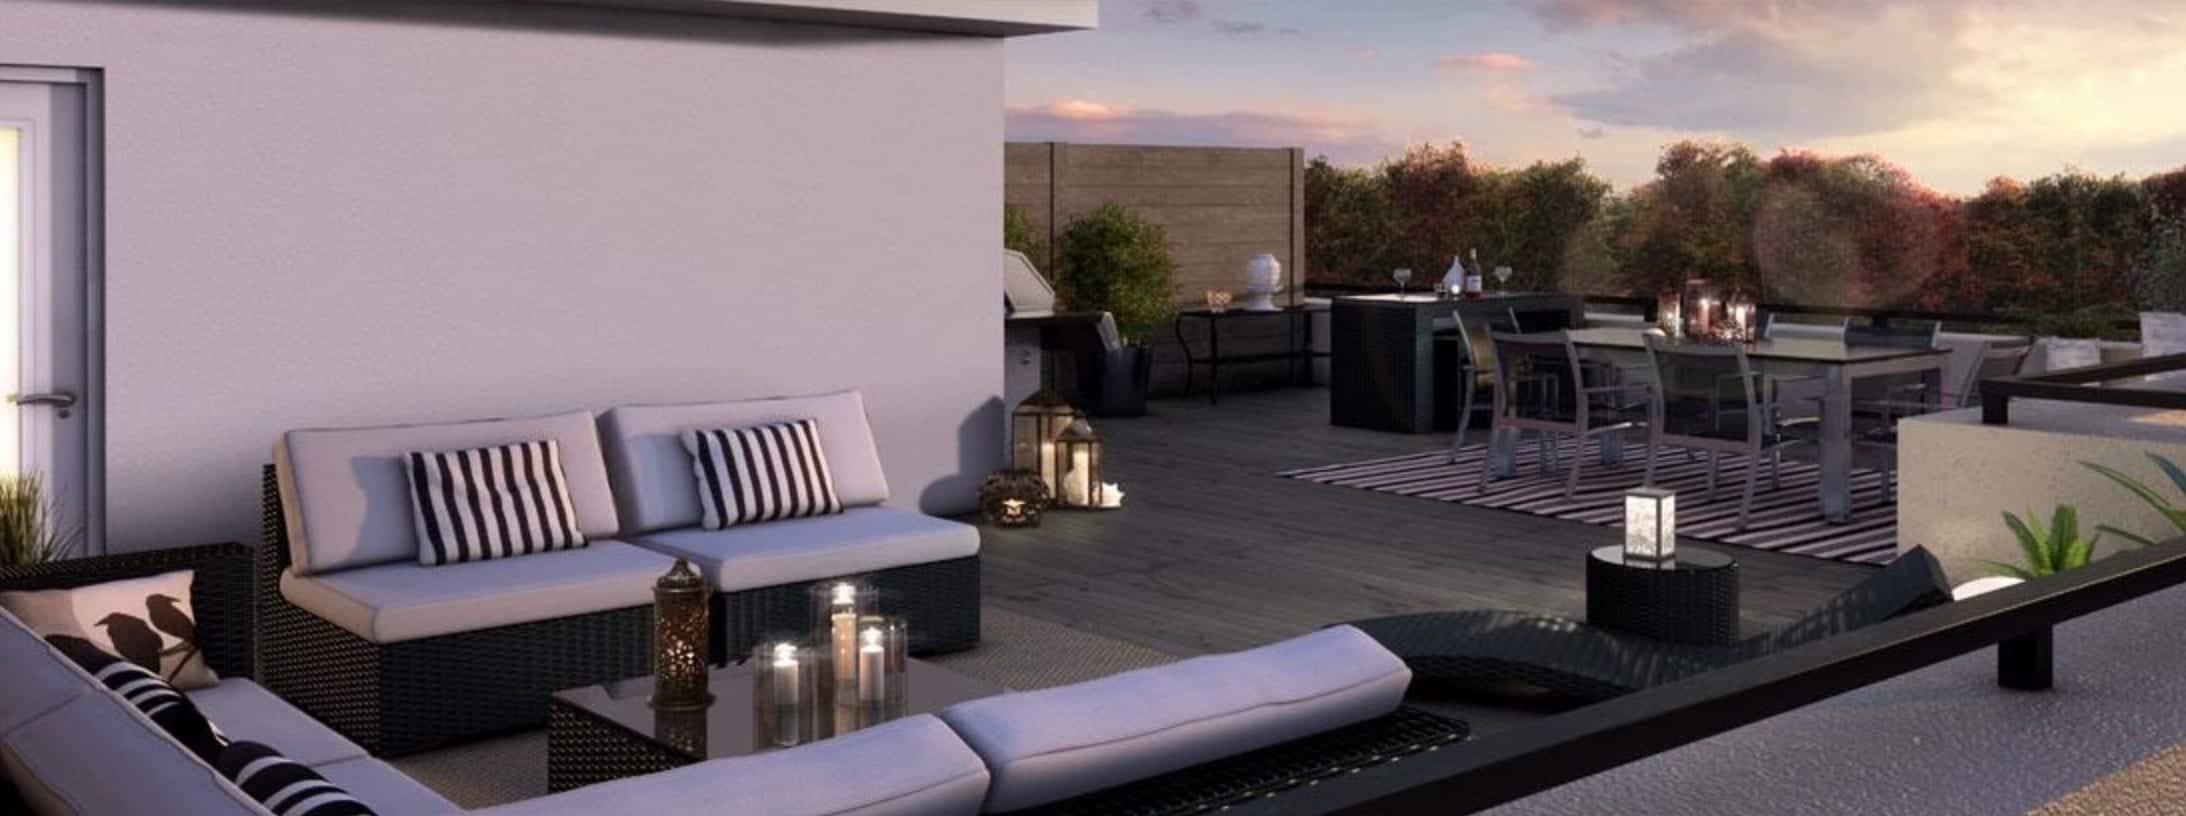 Minto Oakvillage Terrace Patio True Condos